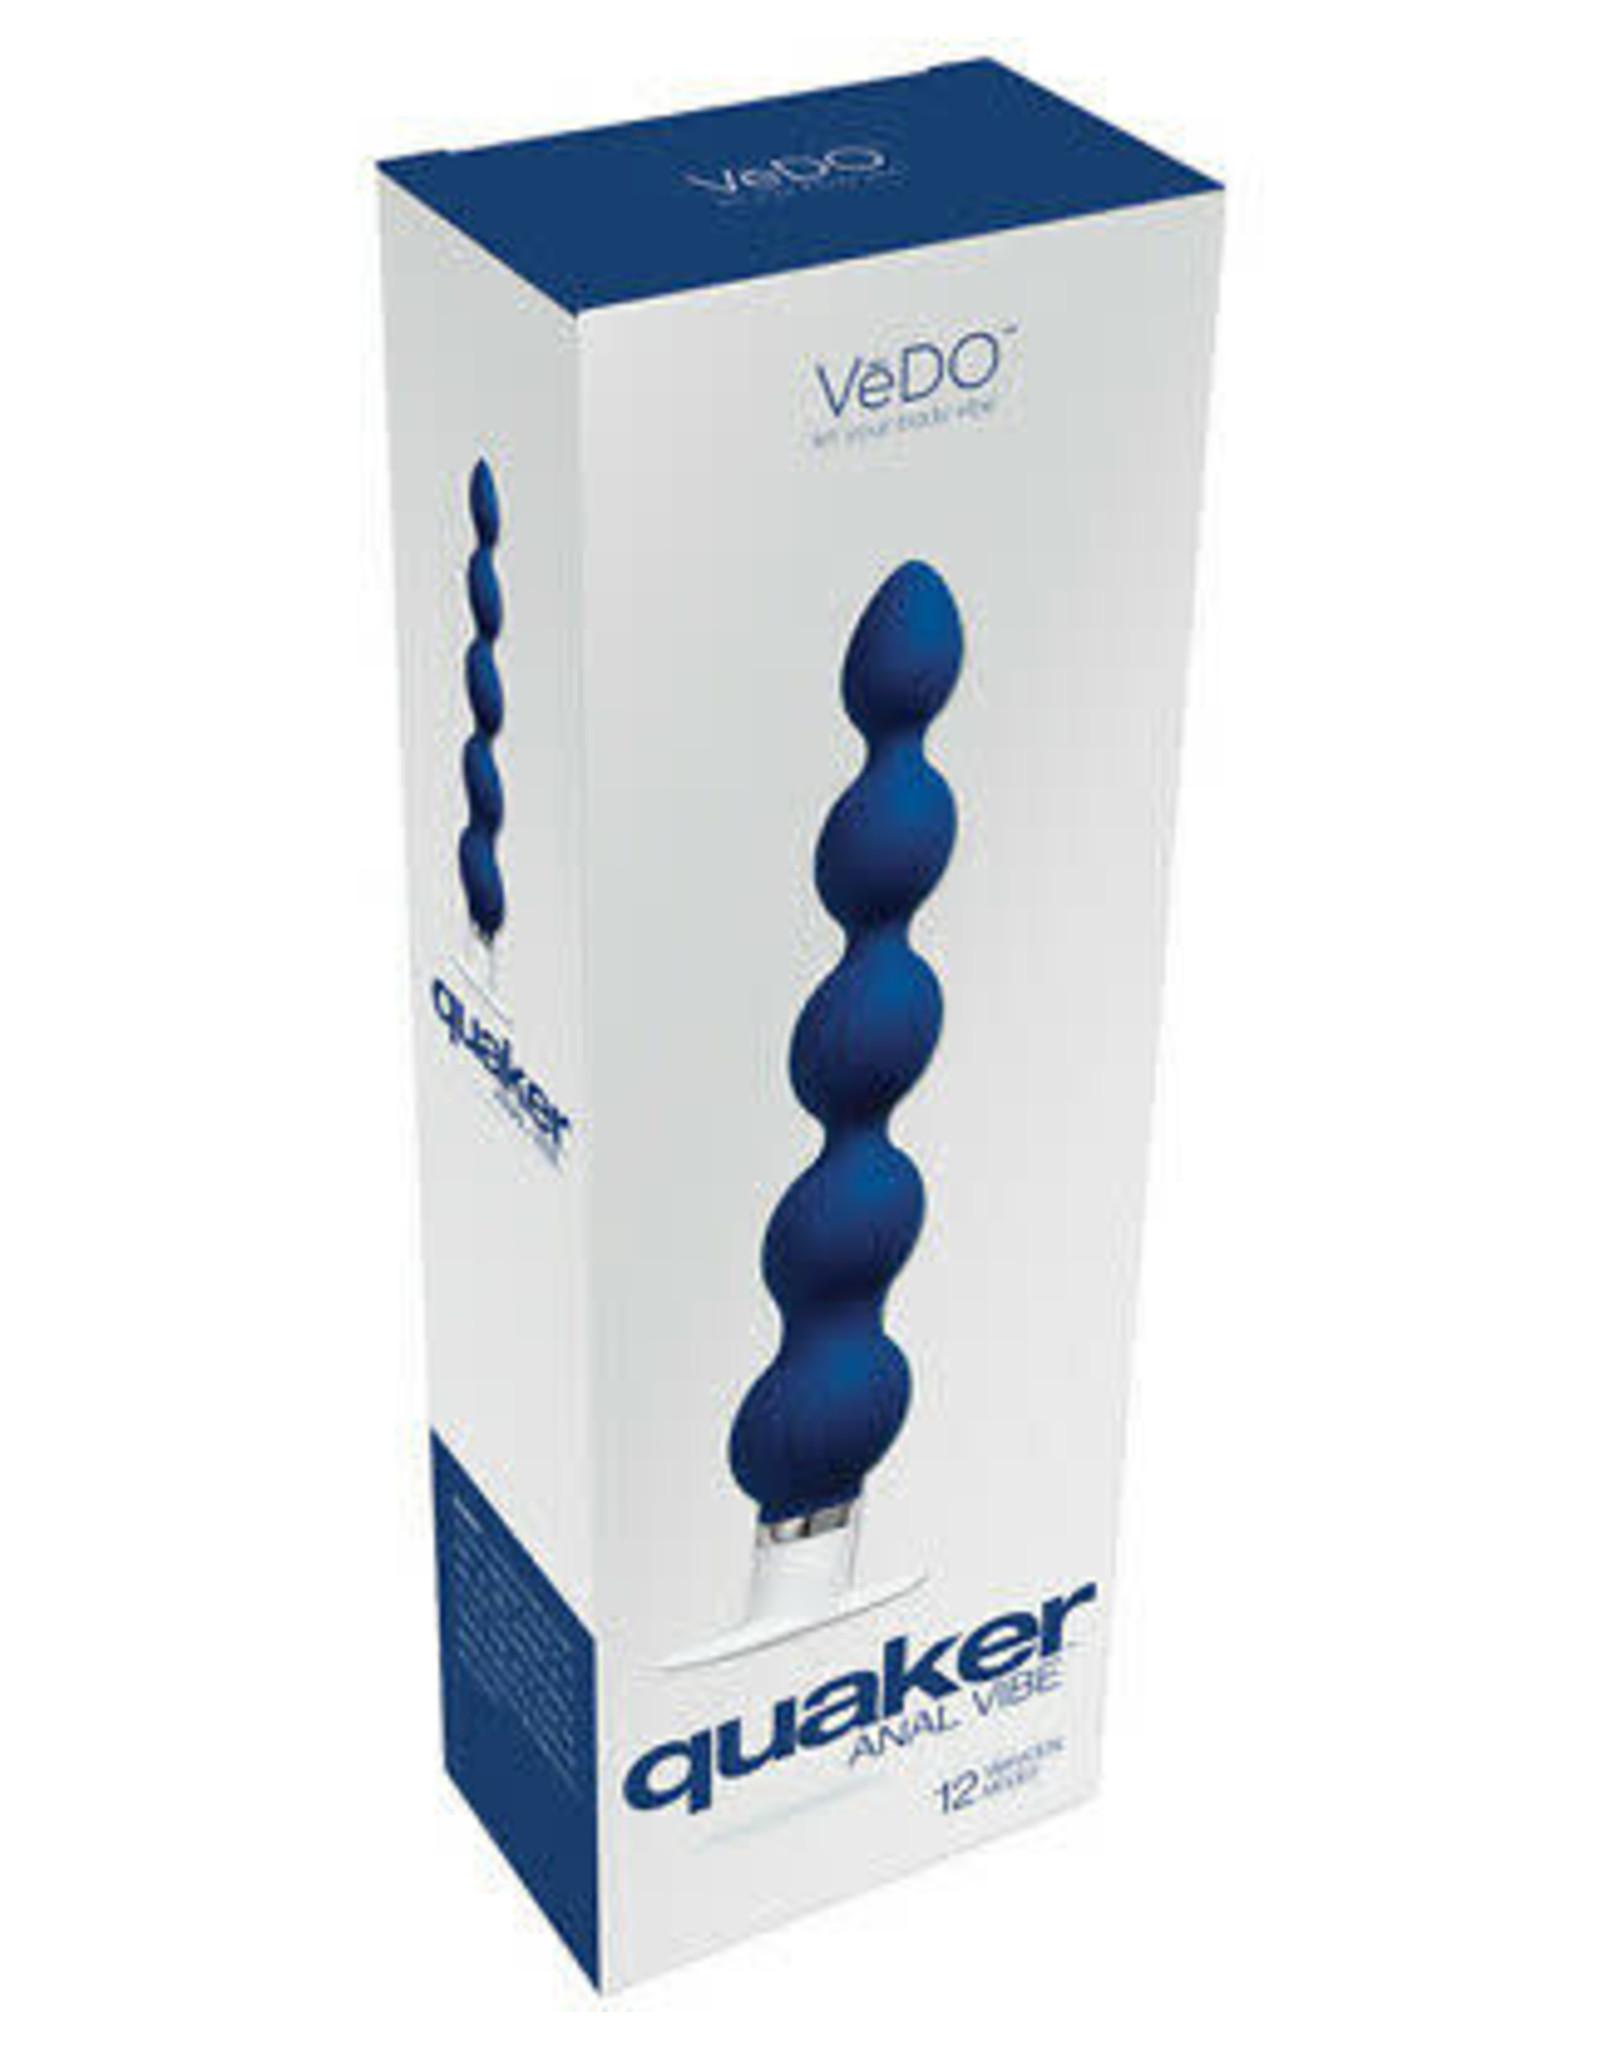 VEDO Quaker Anal Vibe (Blue)